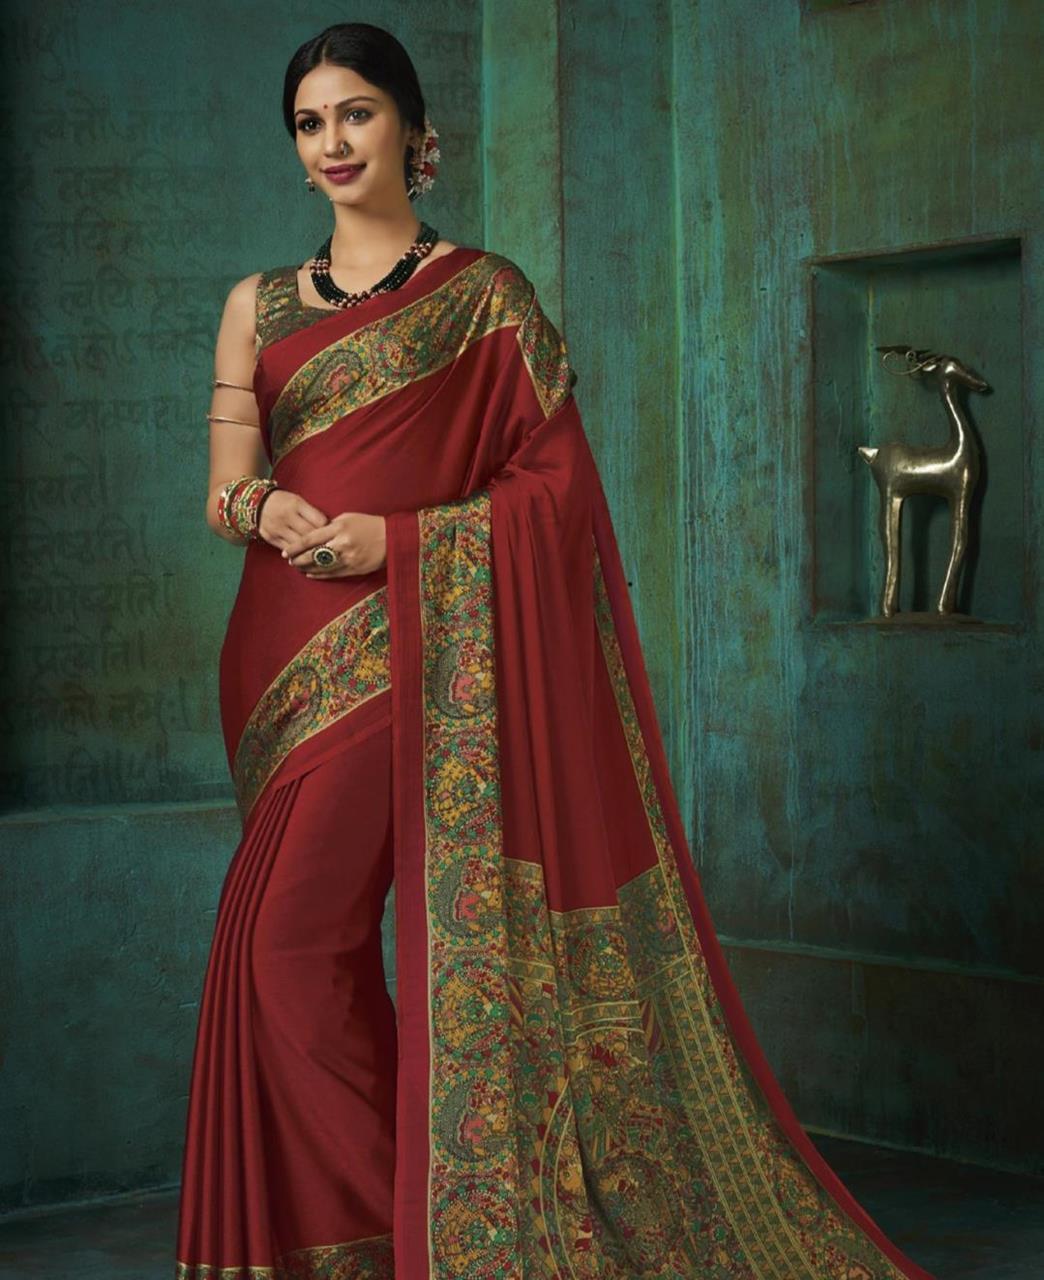 Printed Silk Saree in Maroon